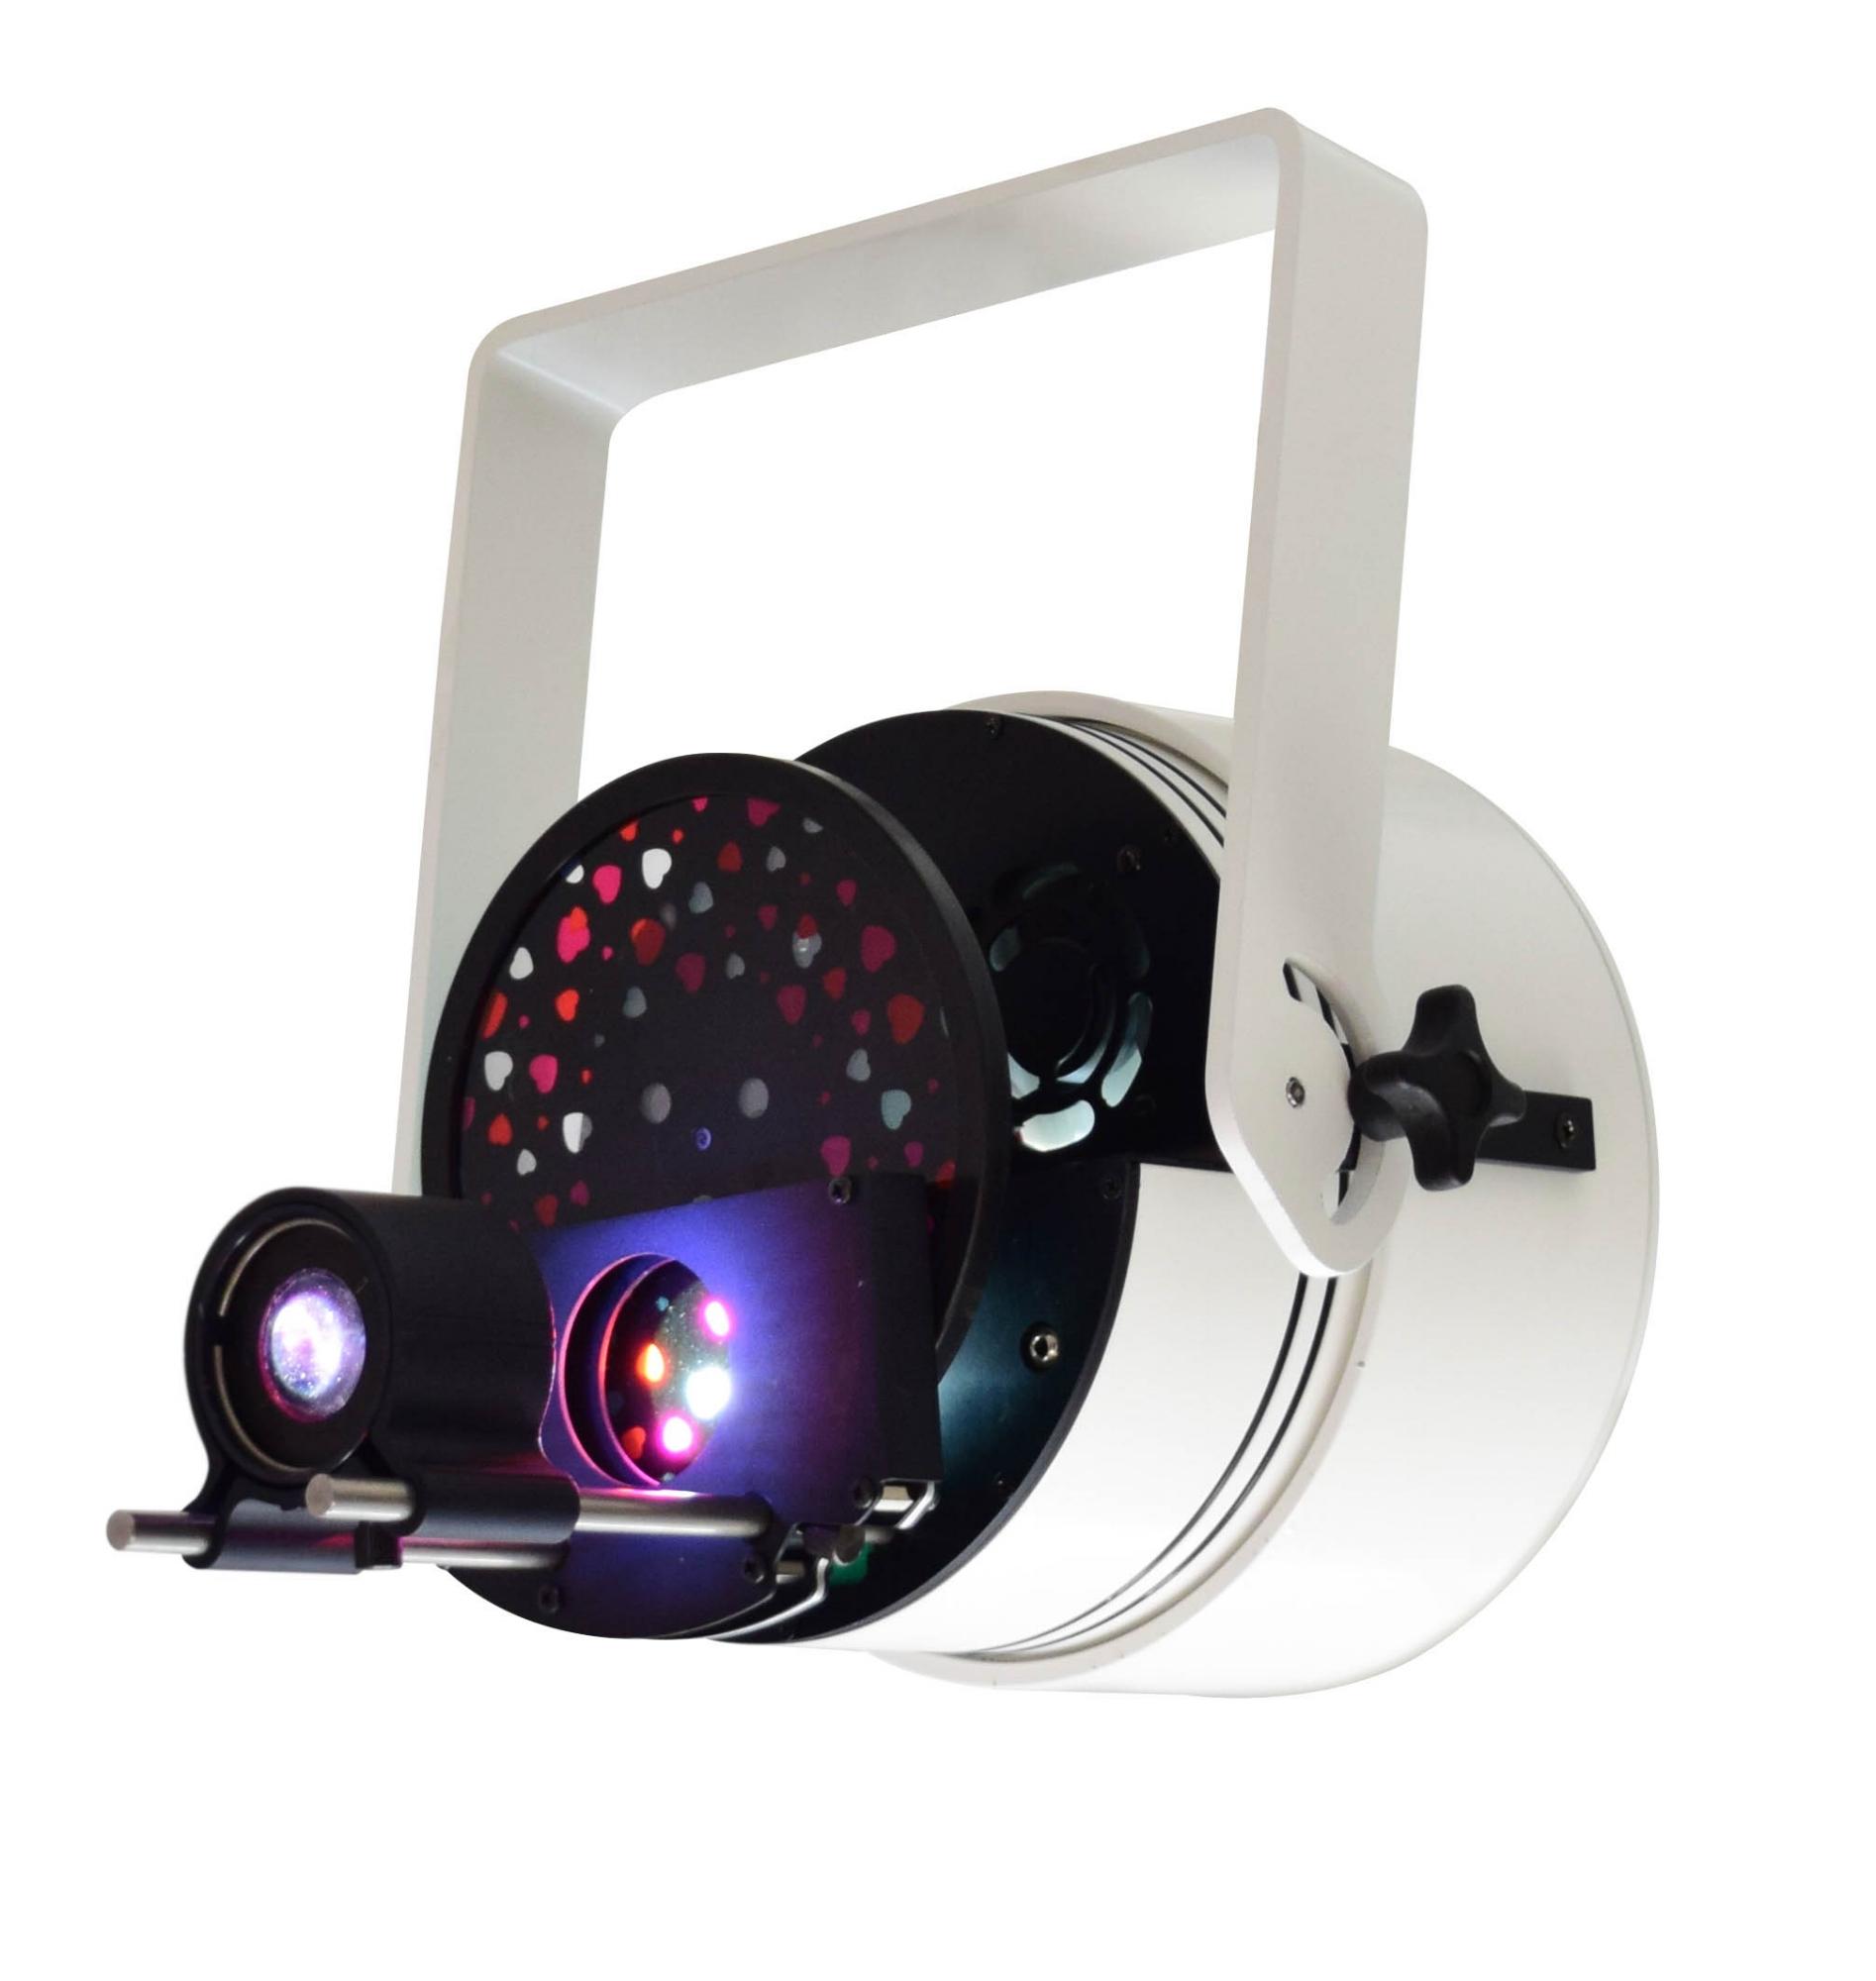 [OPTI] GoBo Pro FX LED